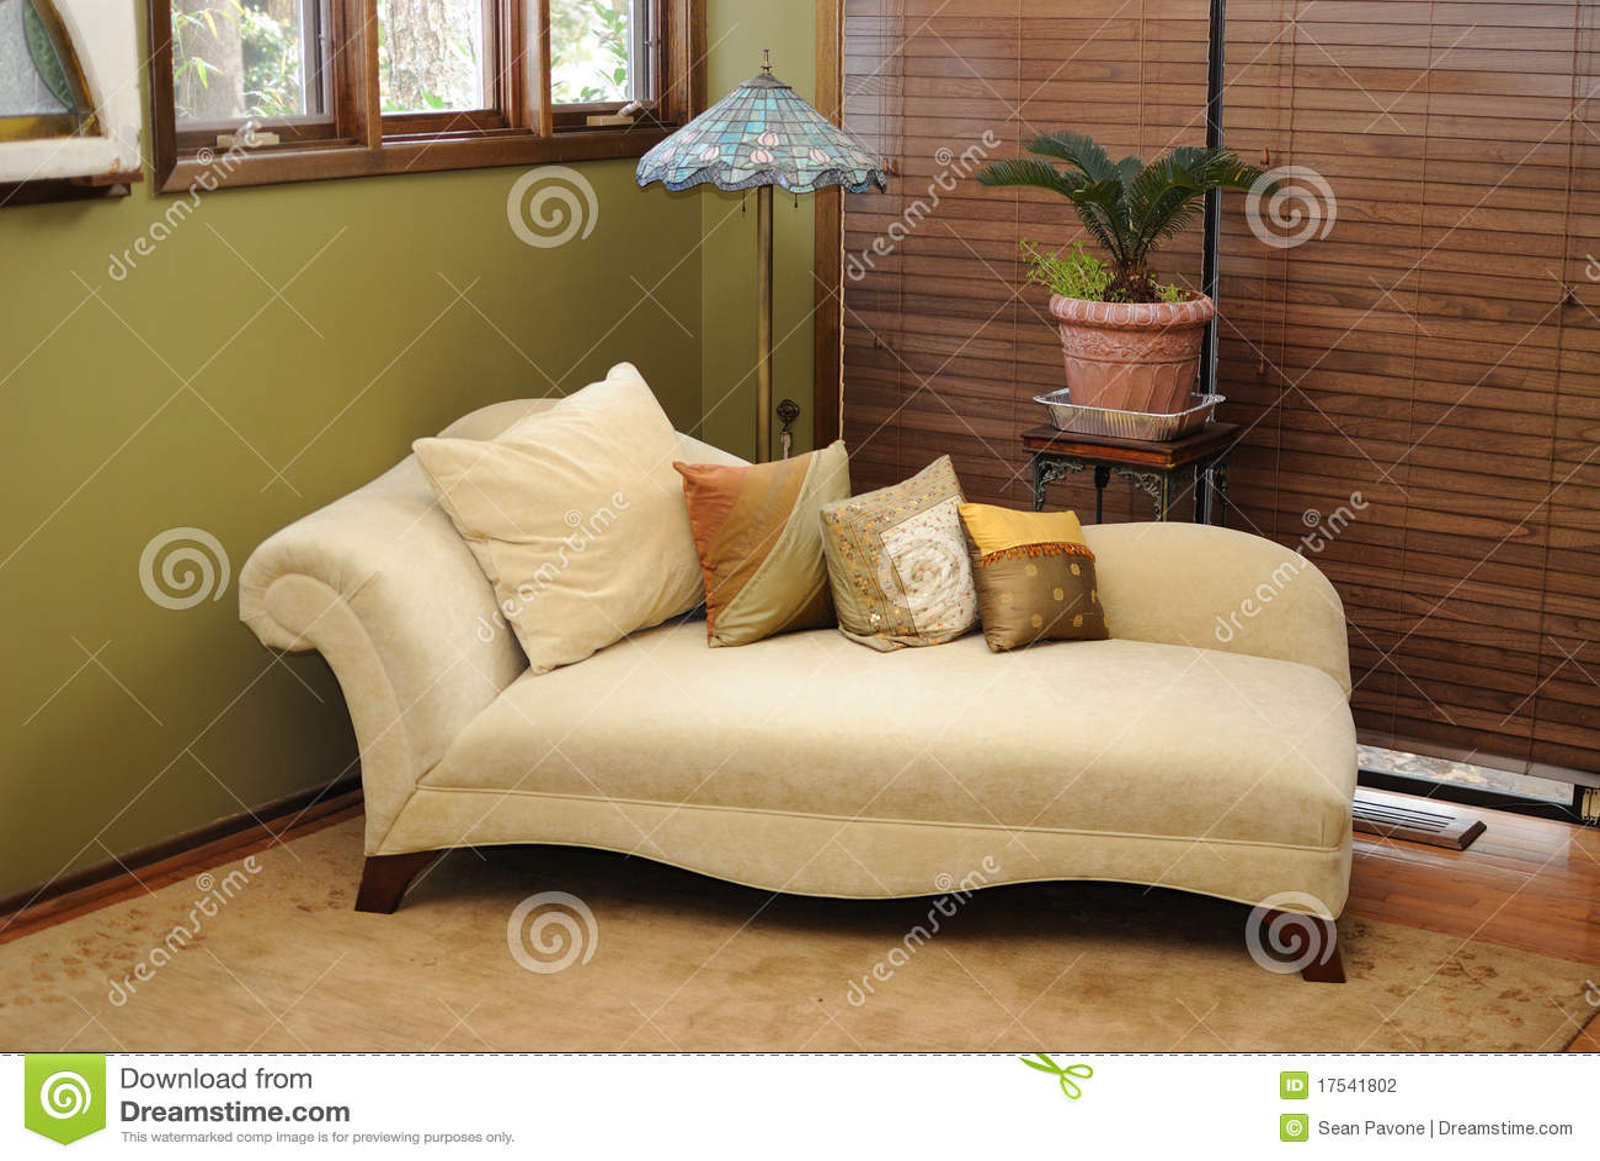 Plush Interior Lounge Chair Stock Photography - Image ...